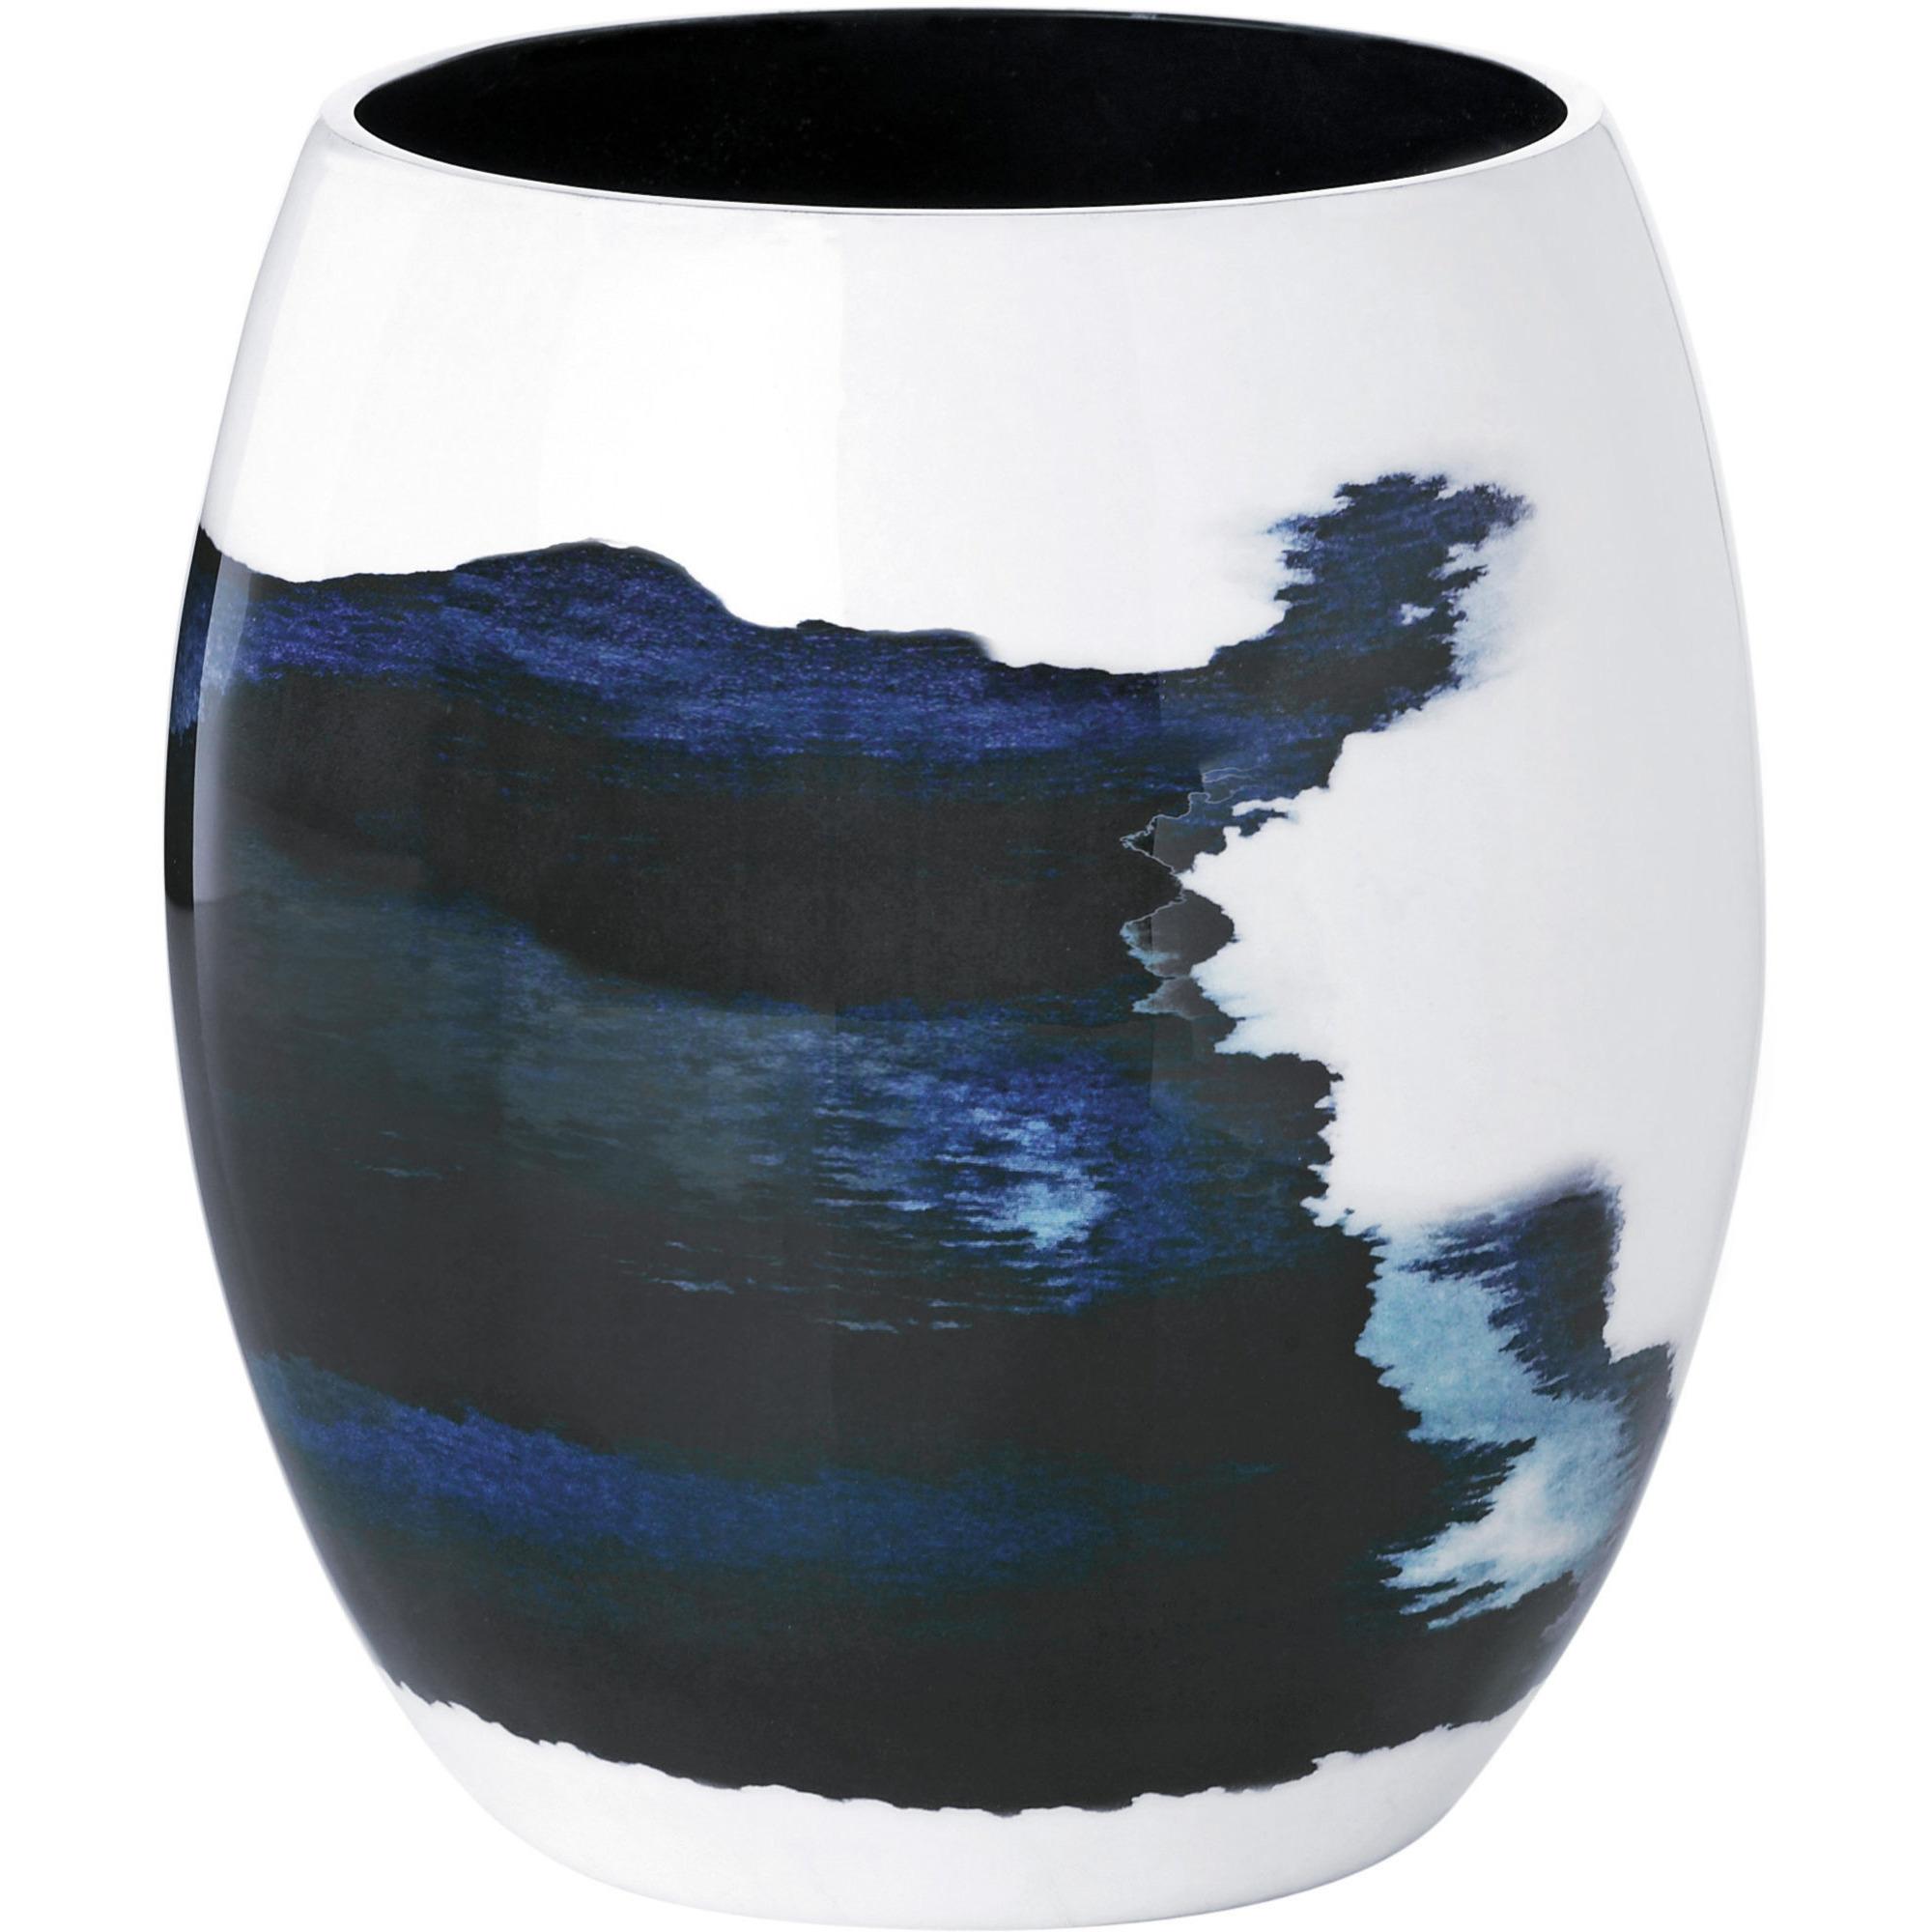 Stelton Stockholm Vas Liten – Aquatic